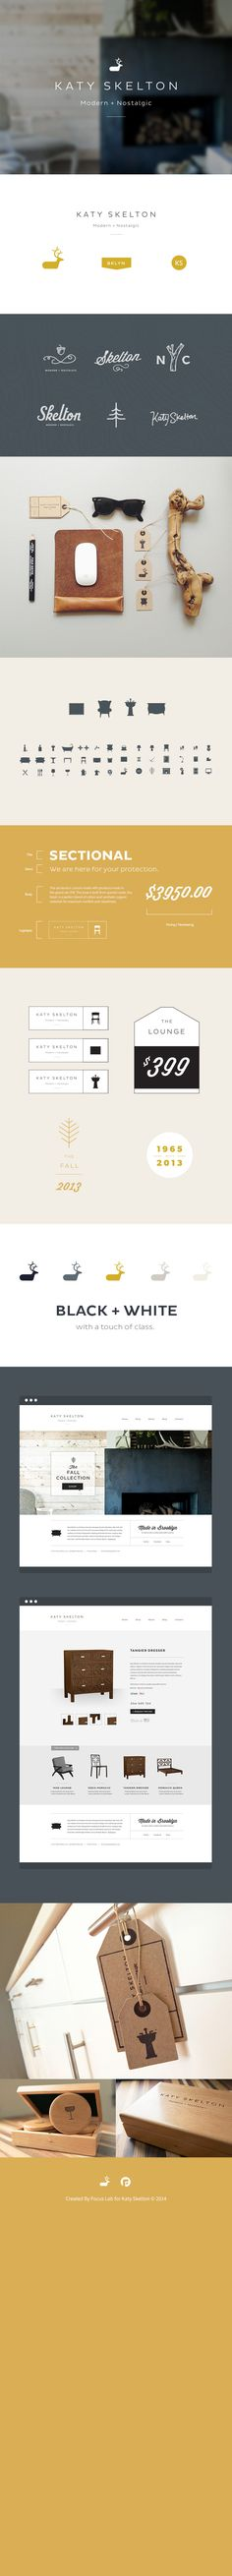 identity / Katy Skelton Branding, Icon Design, Web Design